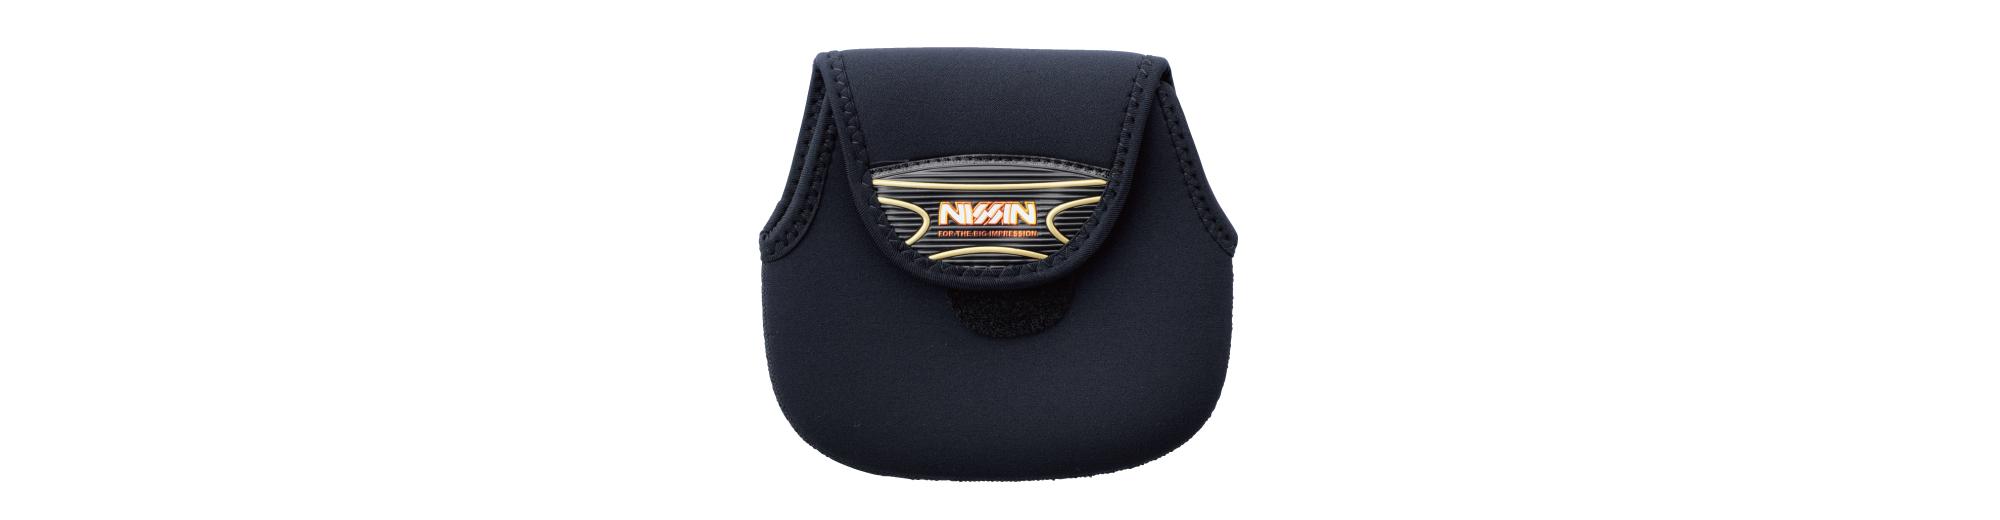 NISSIN リールカバー